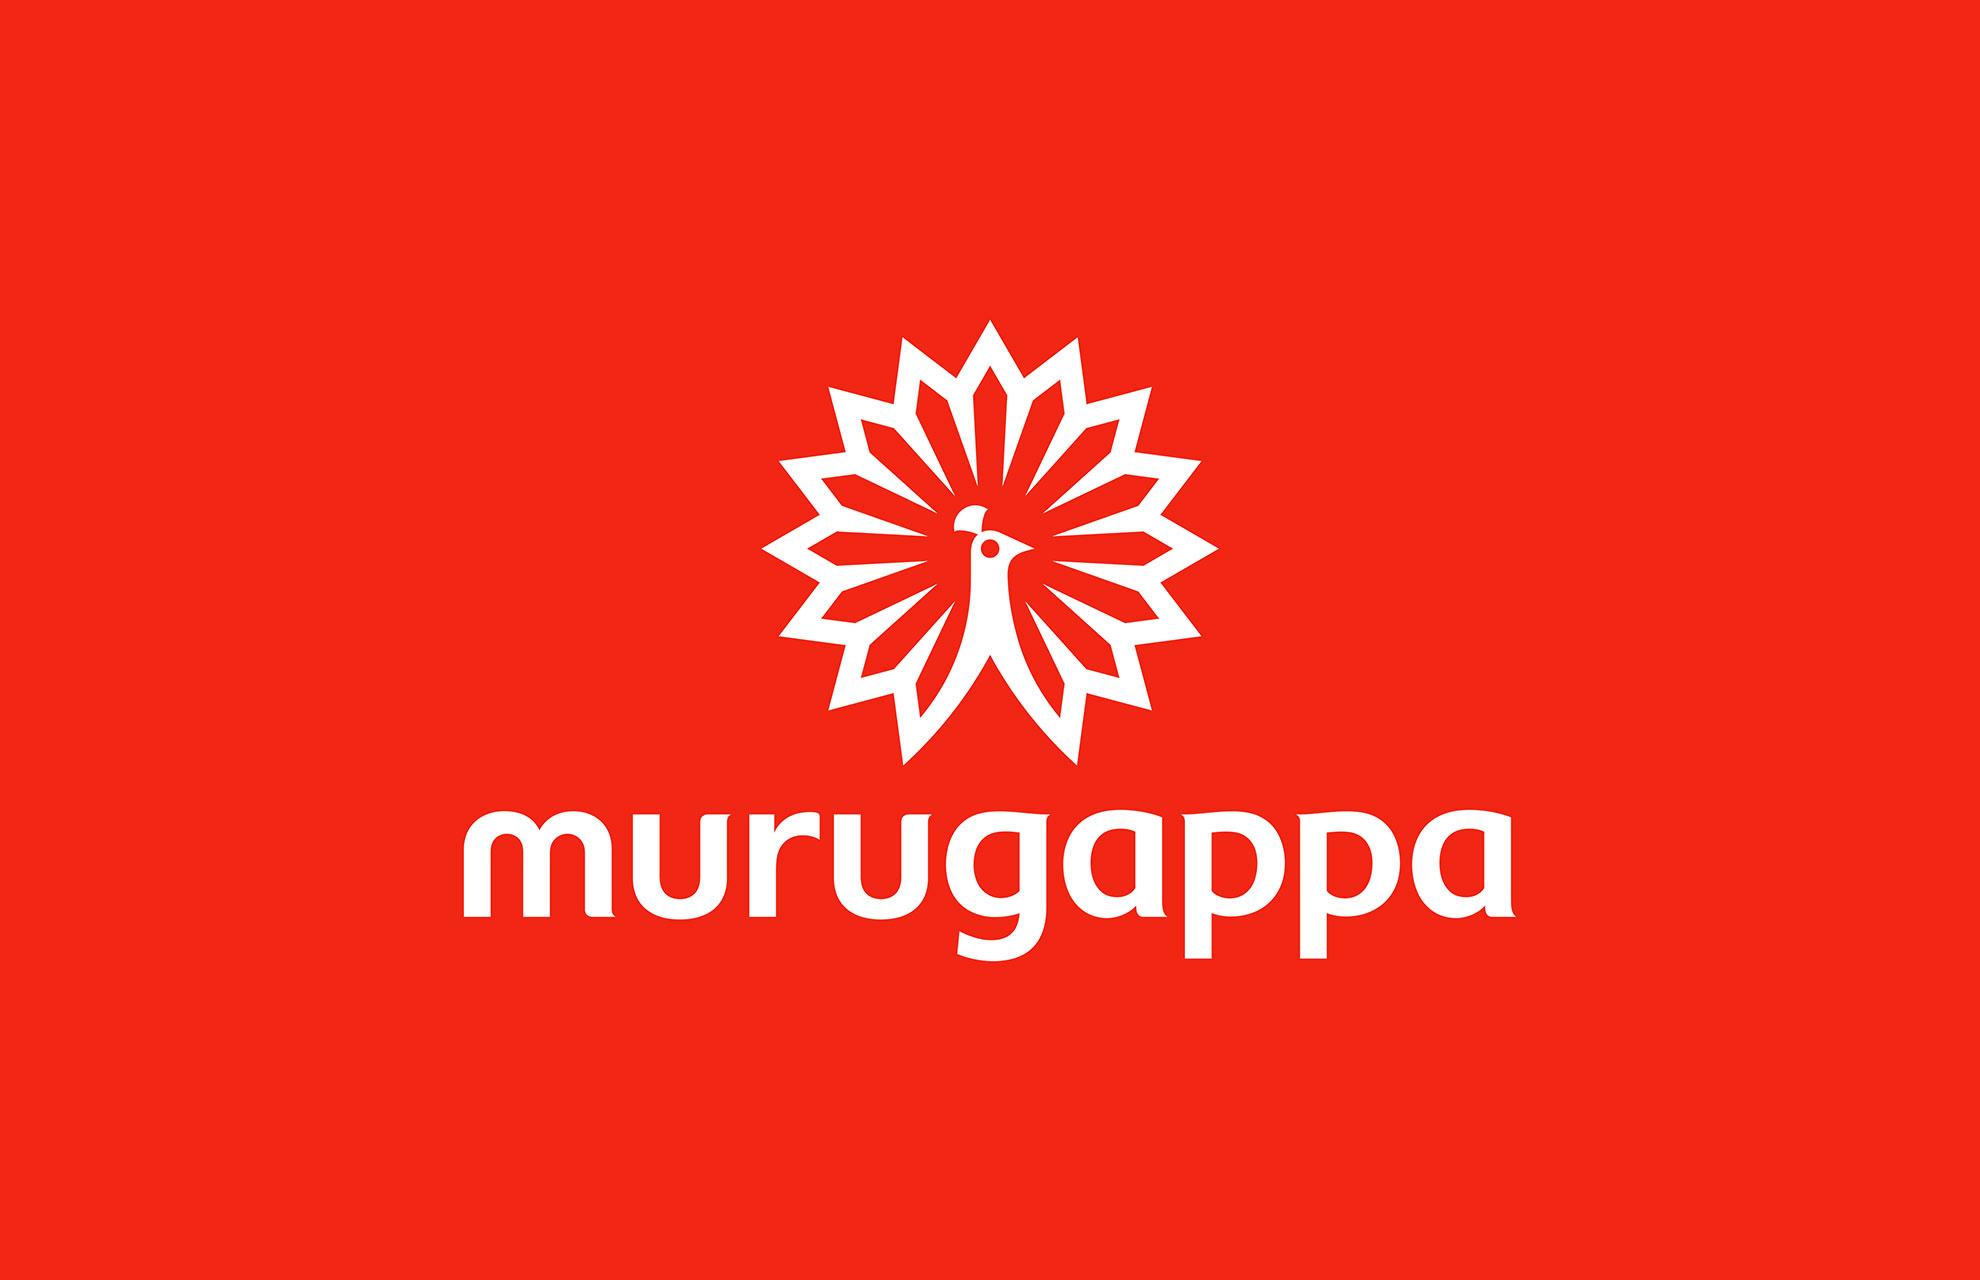 Murugappa Group gets a new identity